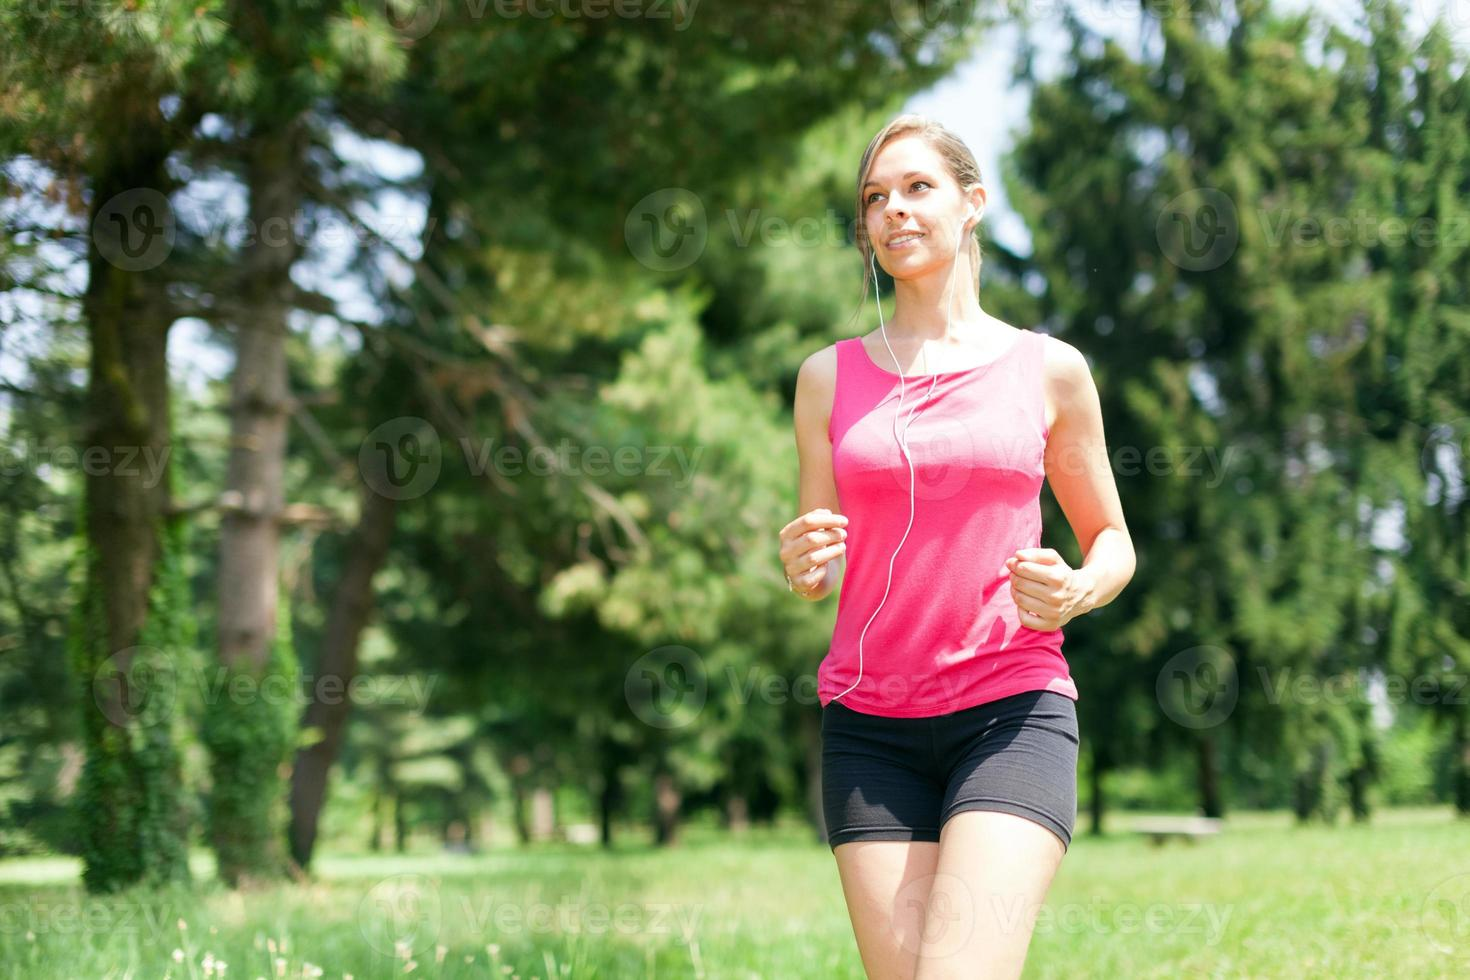 Woman running outdoors photo